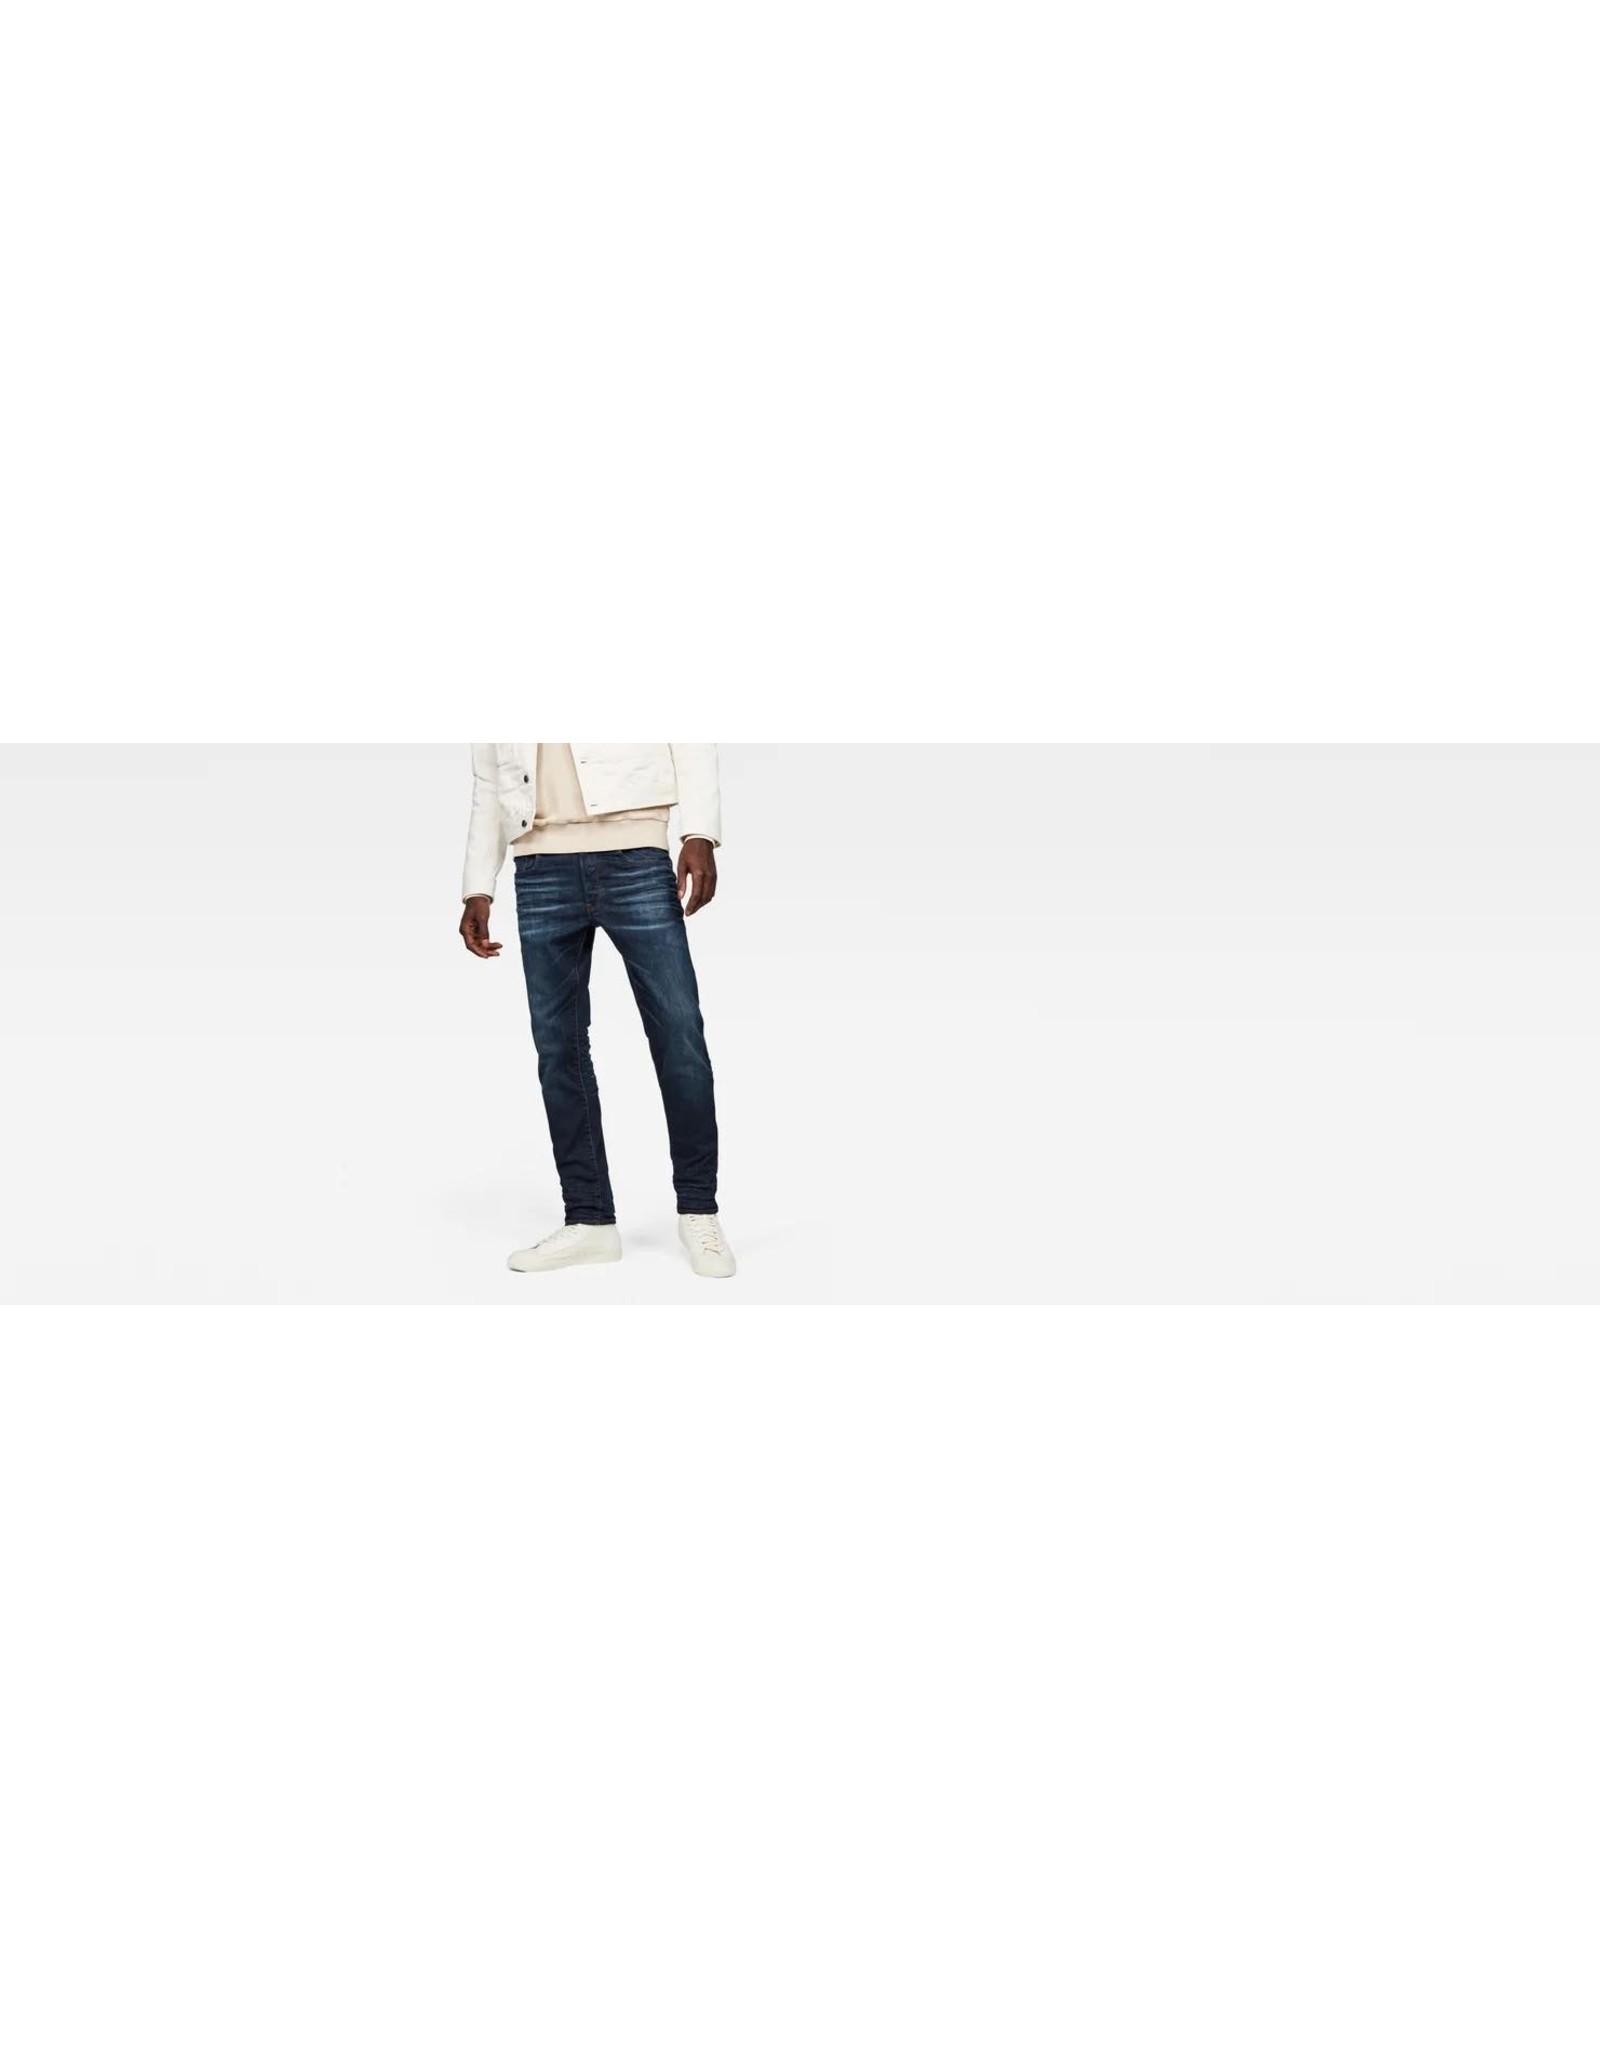 G-Star 3301 Slim jeans ultra dk aged